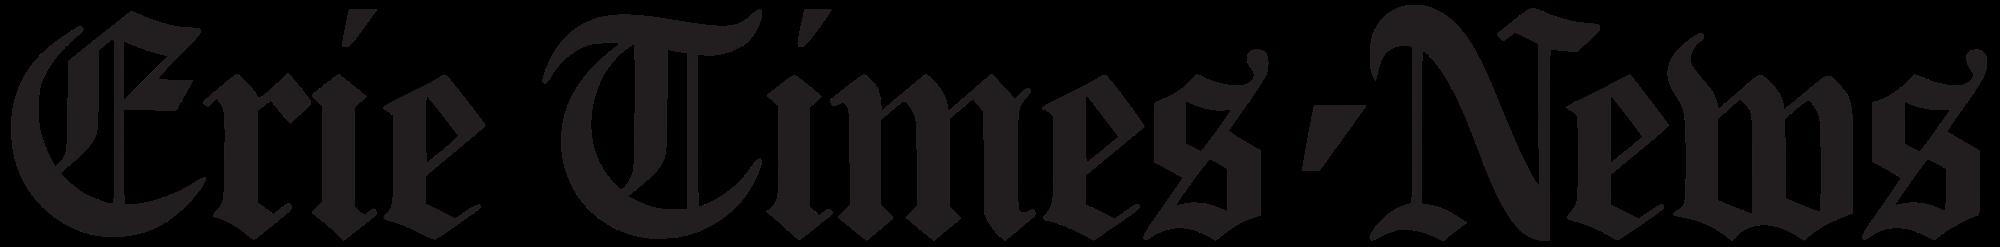 Erie Times News